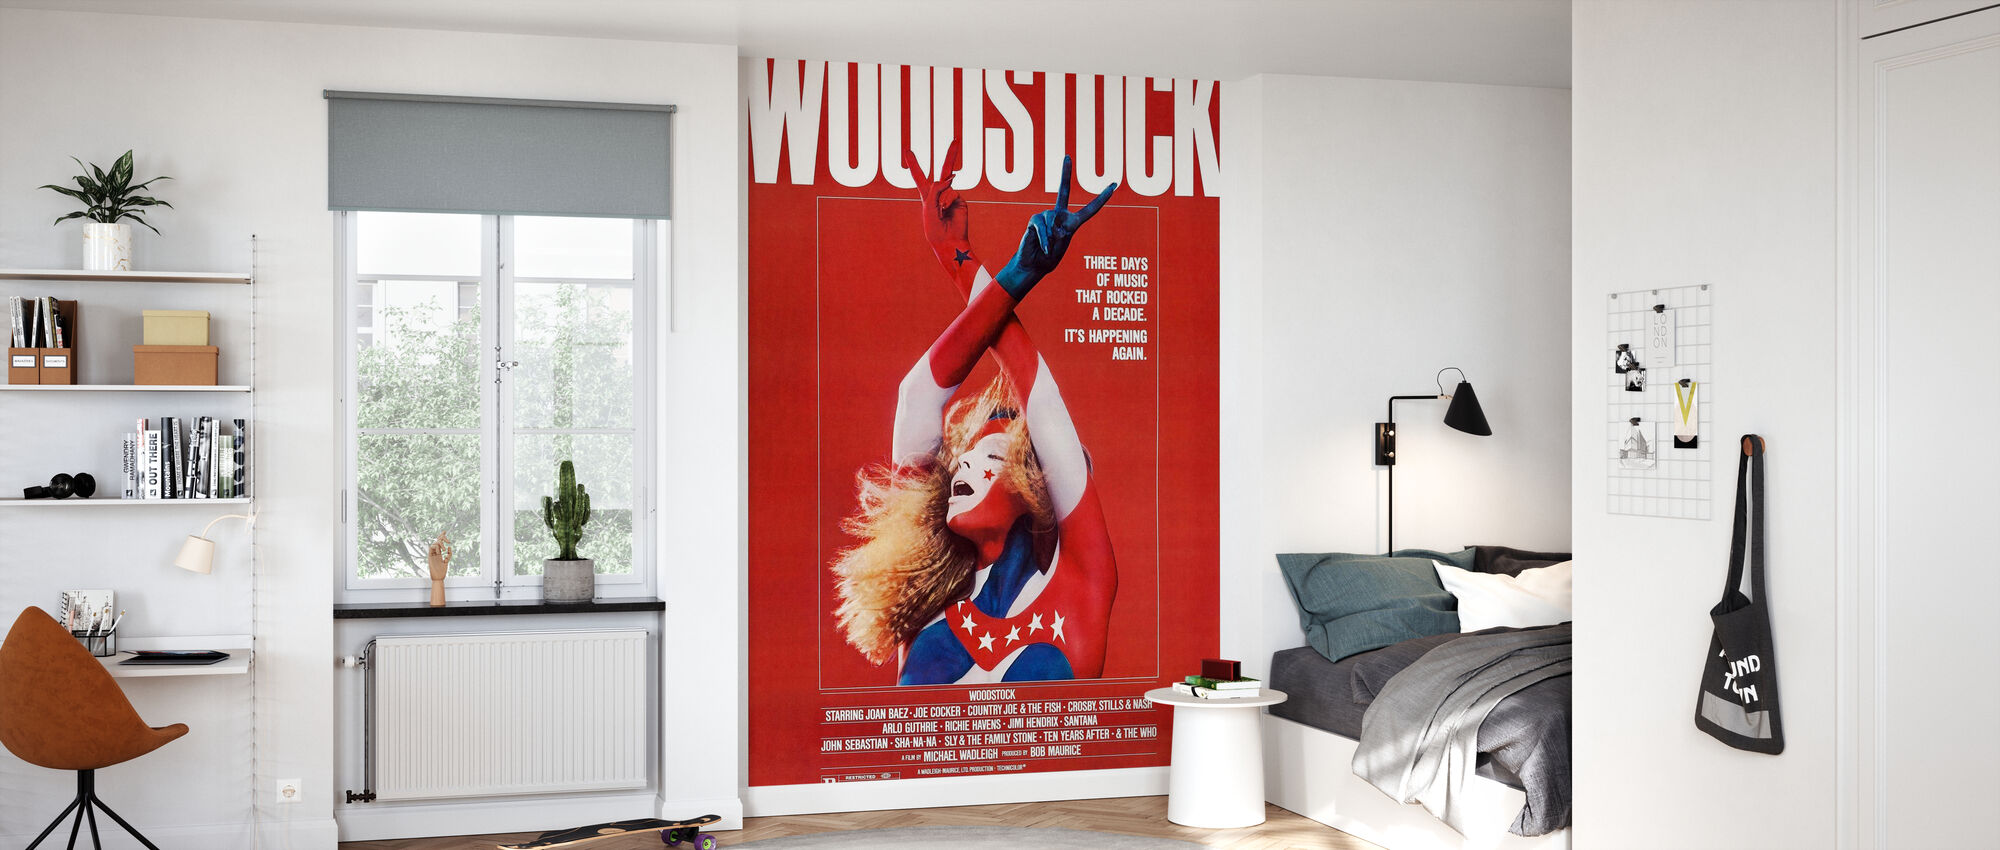 Woodstock Poster Art - Wallpaper - Kids Room